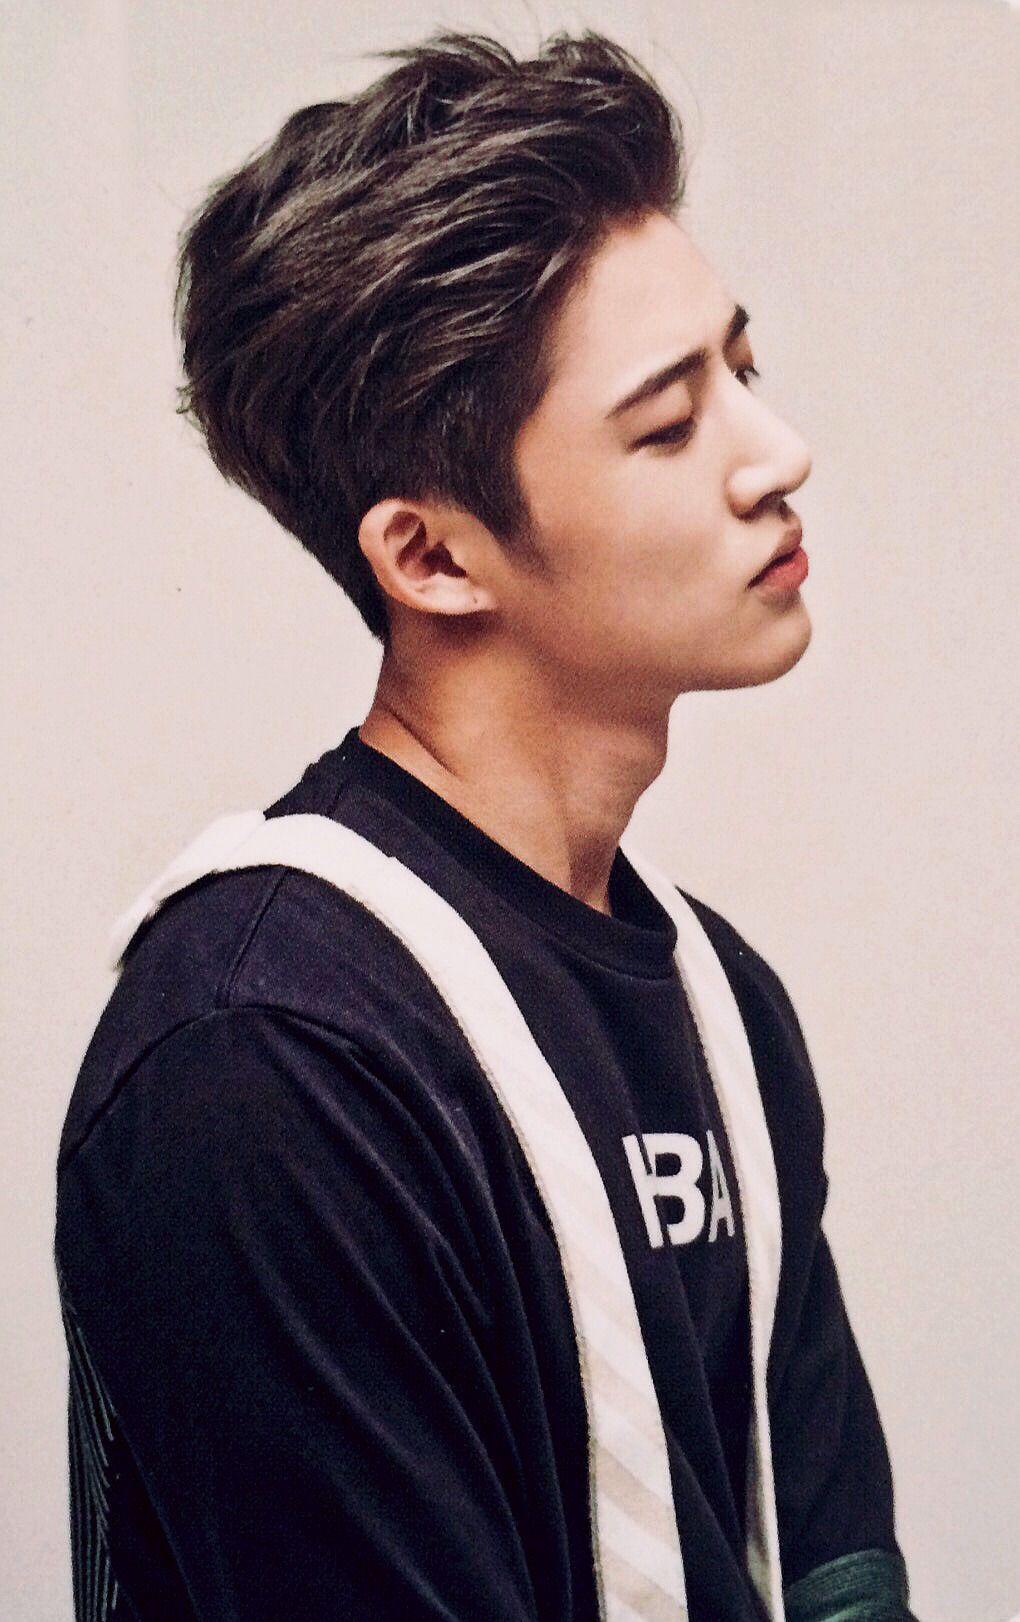 15 Best Male Idol Rapper By Koreanews 1 G Dragon 2 Top 3 Mino 5 Bobby 7 Hanbin 13 Seunghoon Via Ygentertalnment Hanbin Ikon Kim Hanbin Ikon